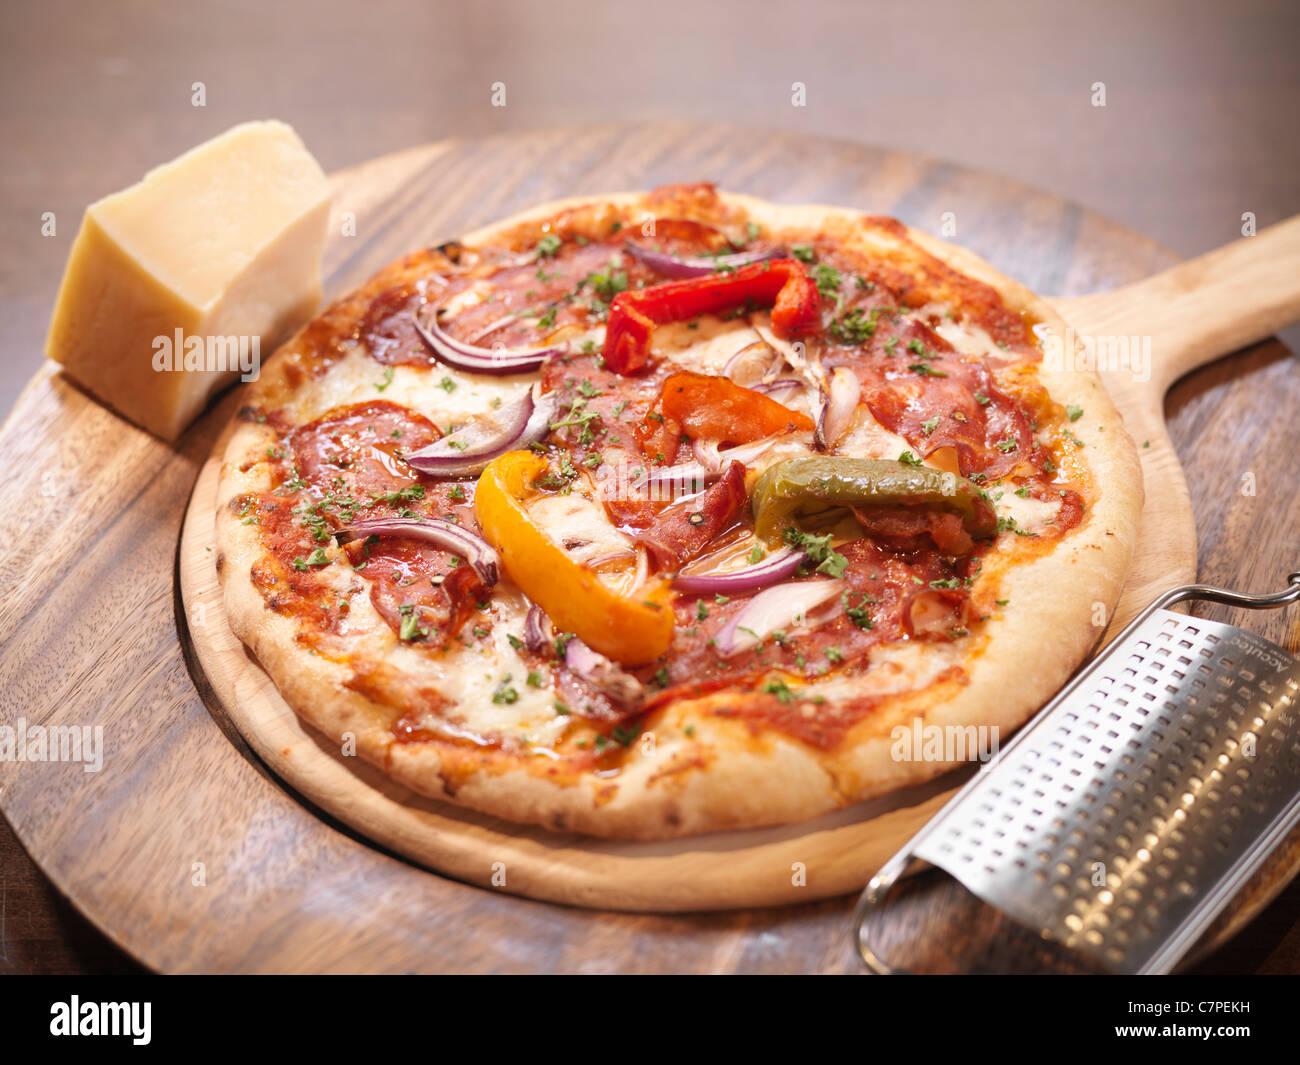 Plate of artisan pizza in restaurant - Stock Image